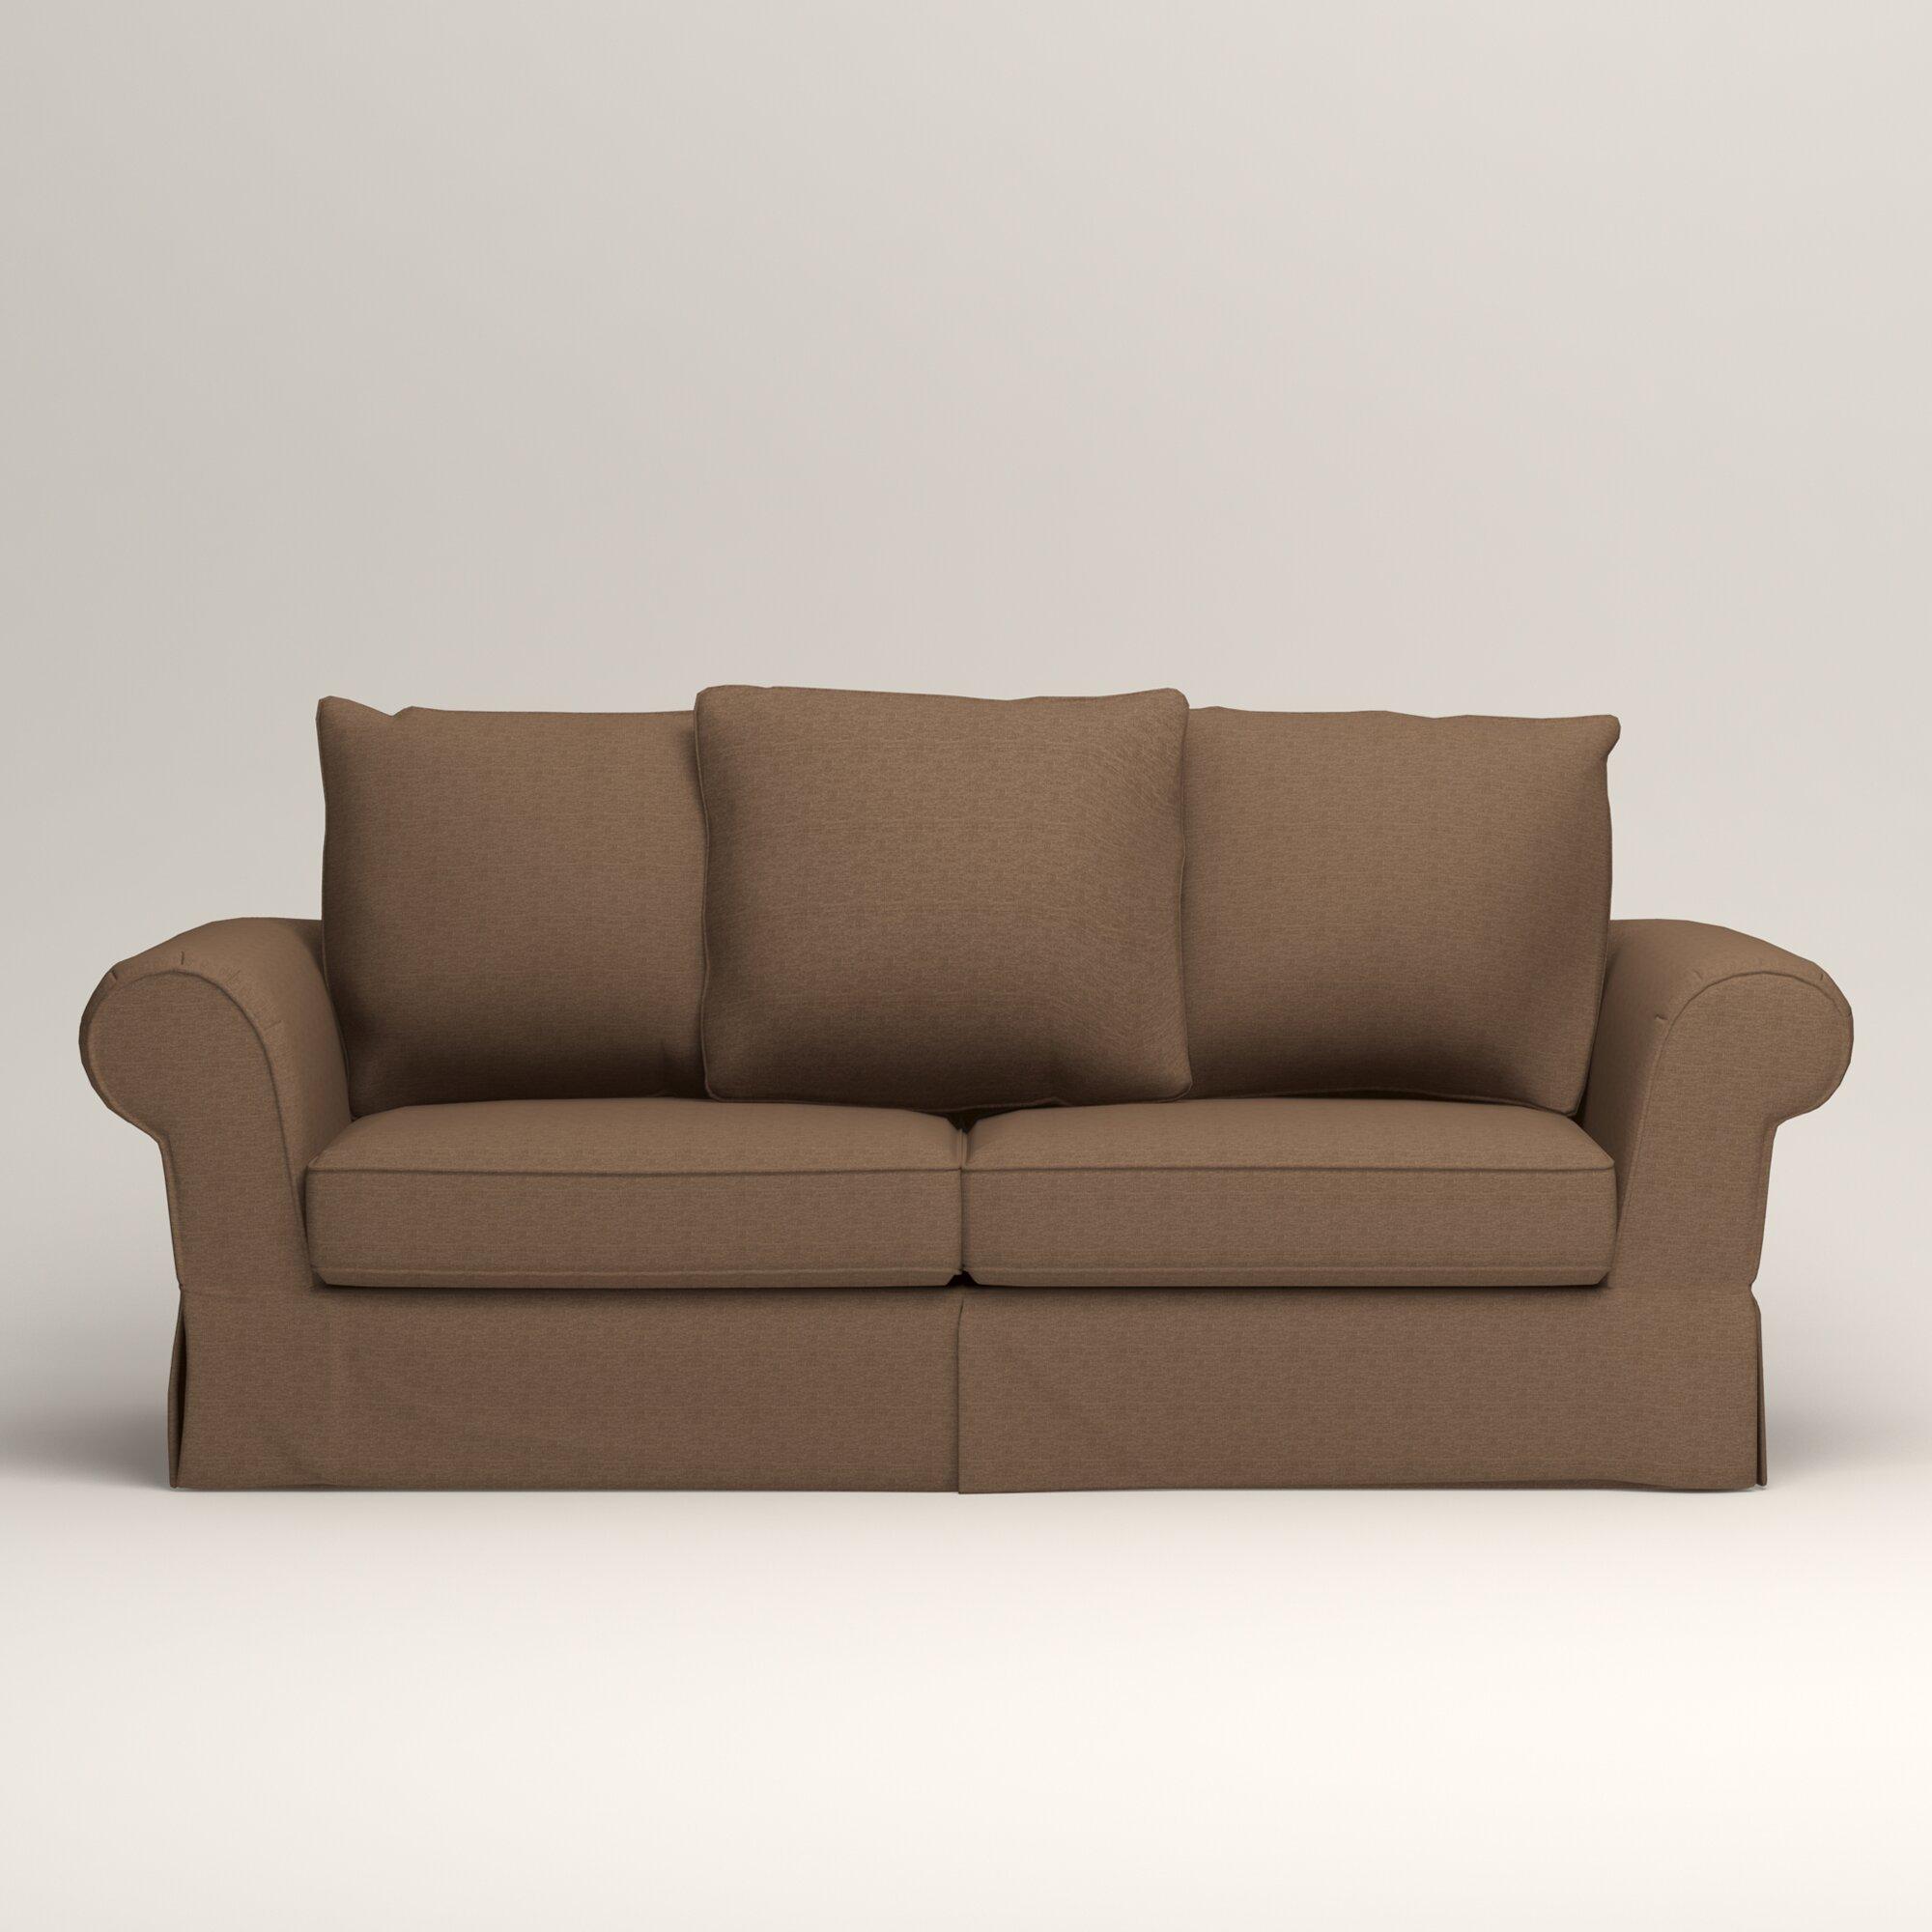 Birch lane owen sleeper sofa reviews wayfair for Lane sectional sleeper sofa